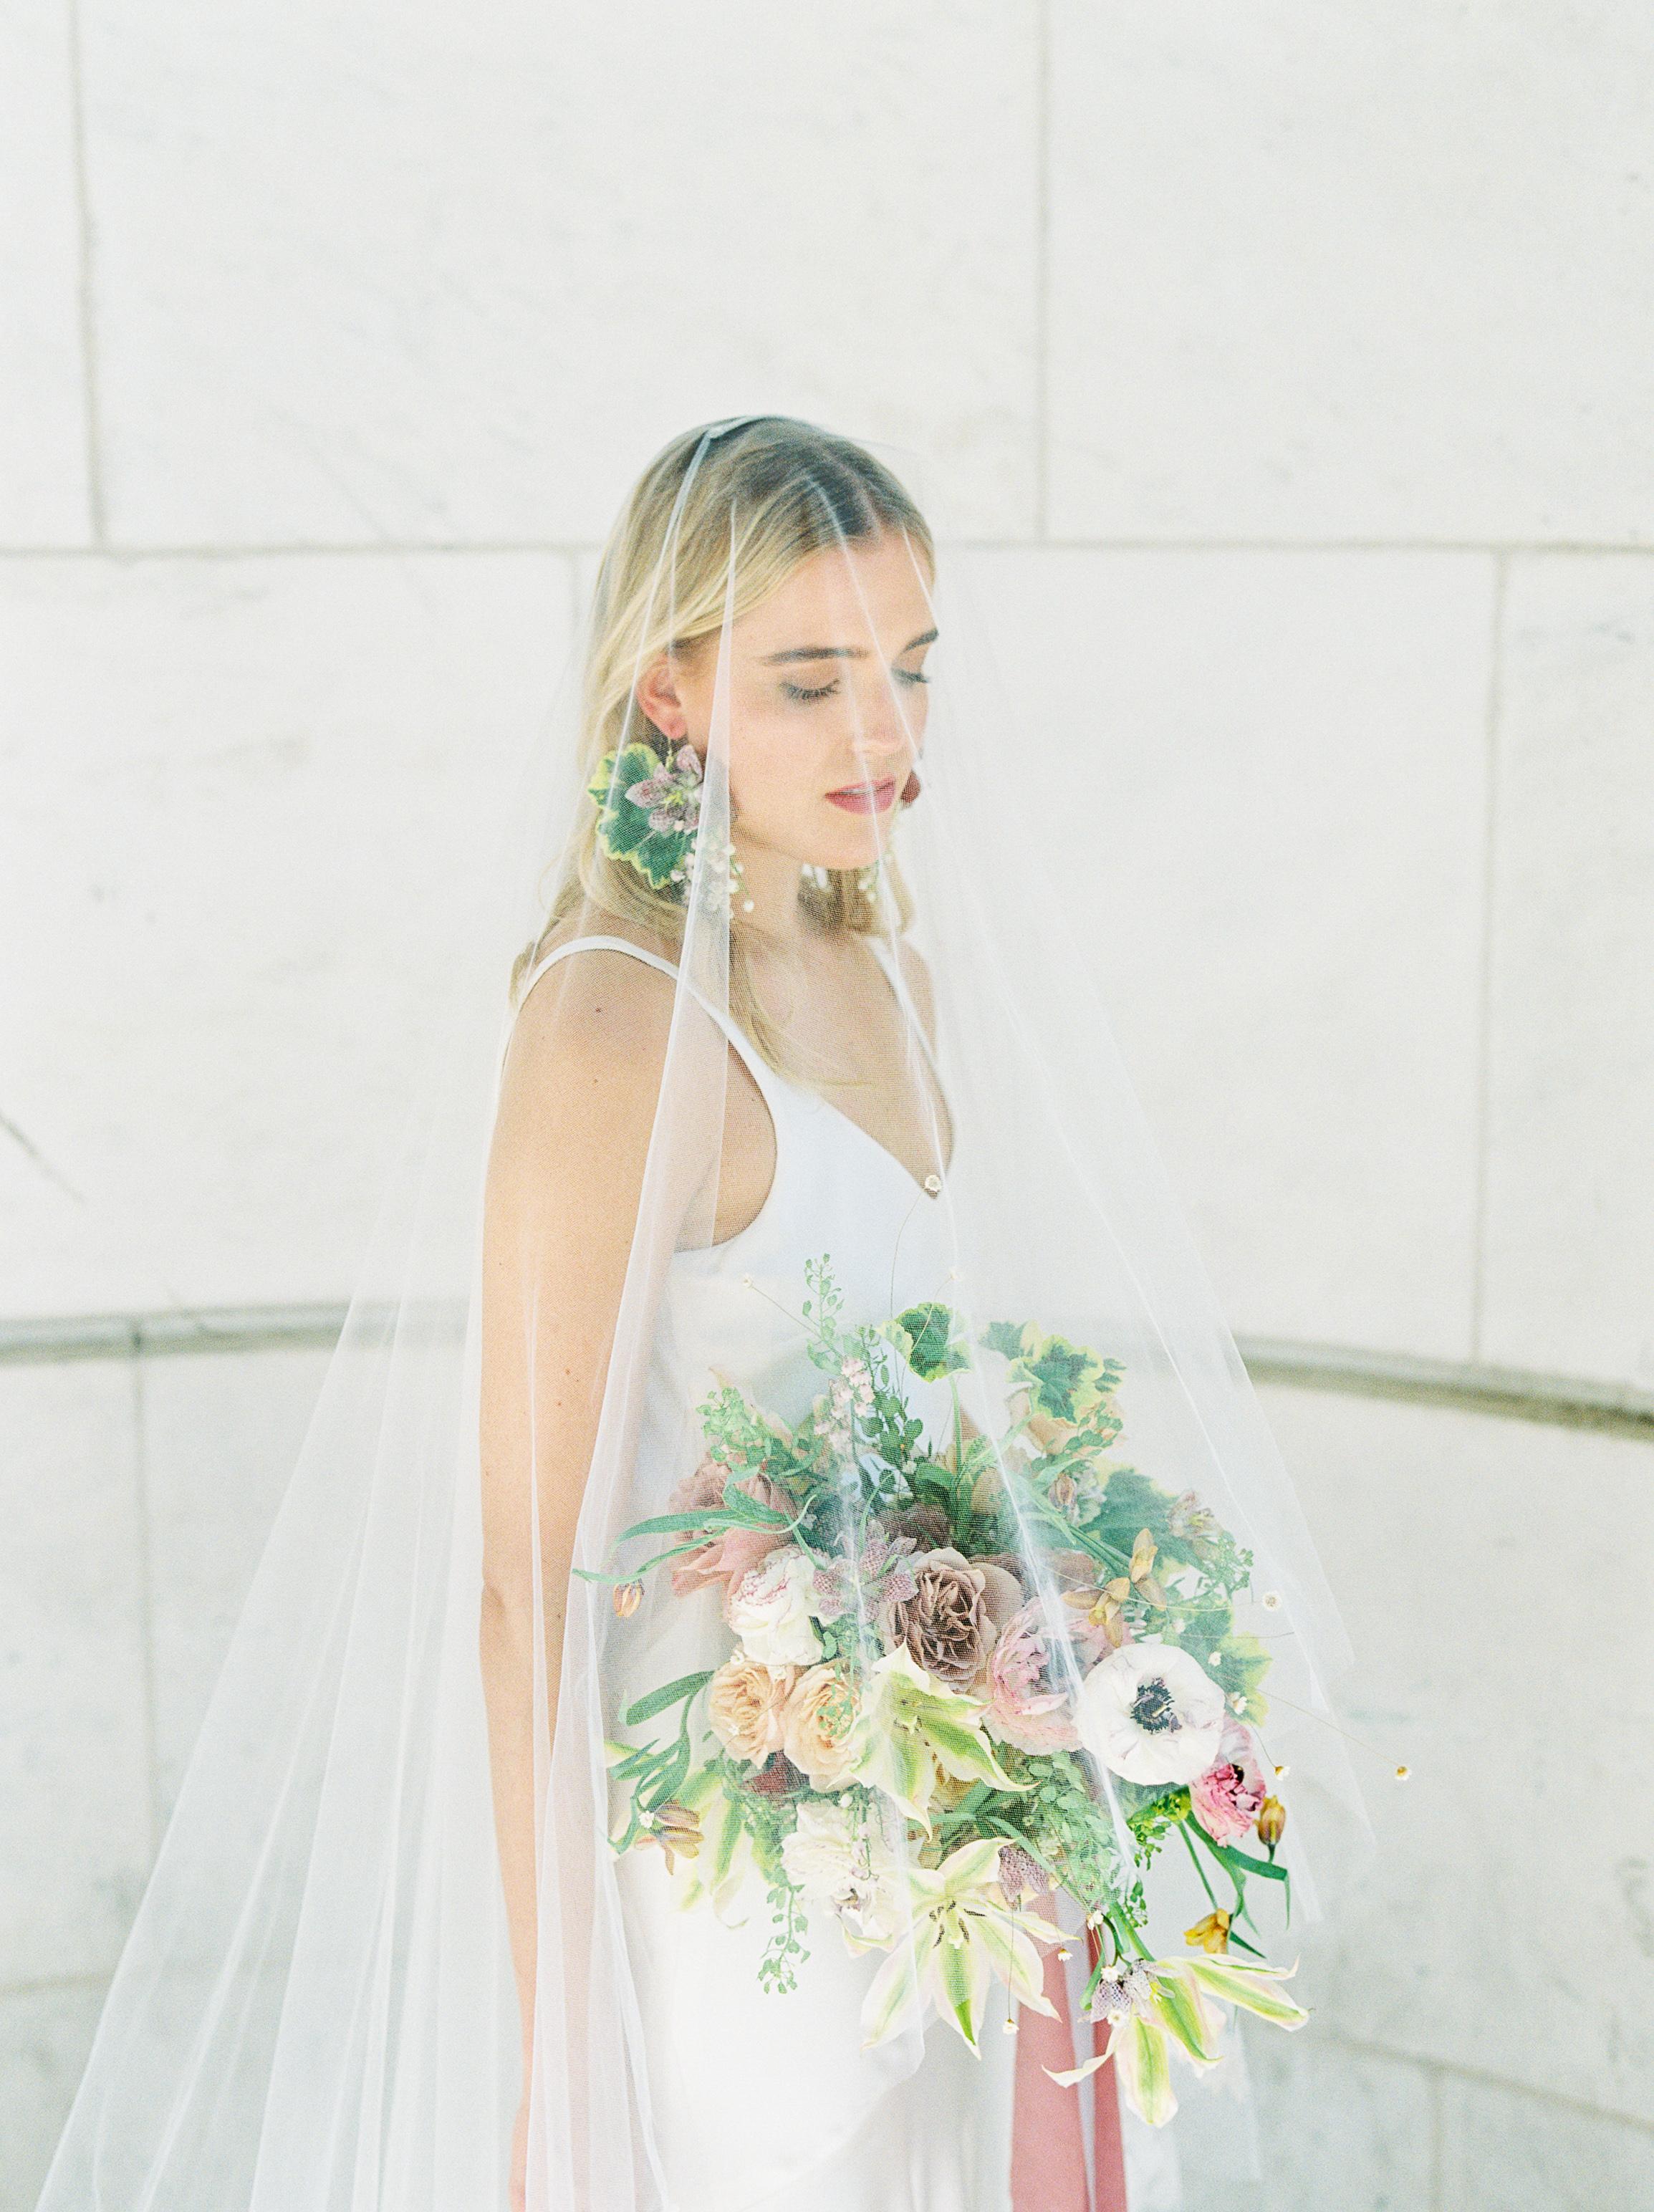 20180508-Pura-Soul-Photo-nyc-bridal--51.jpg